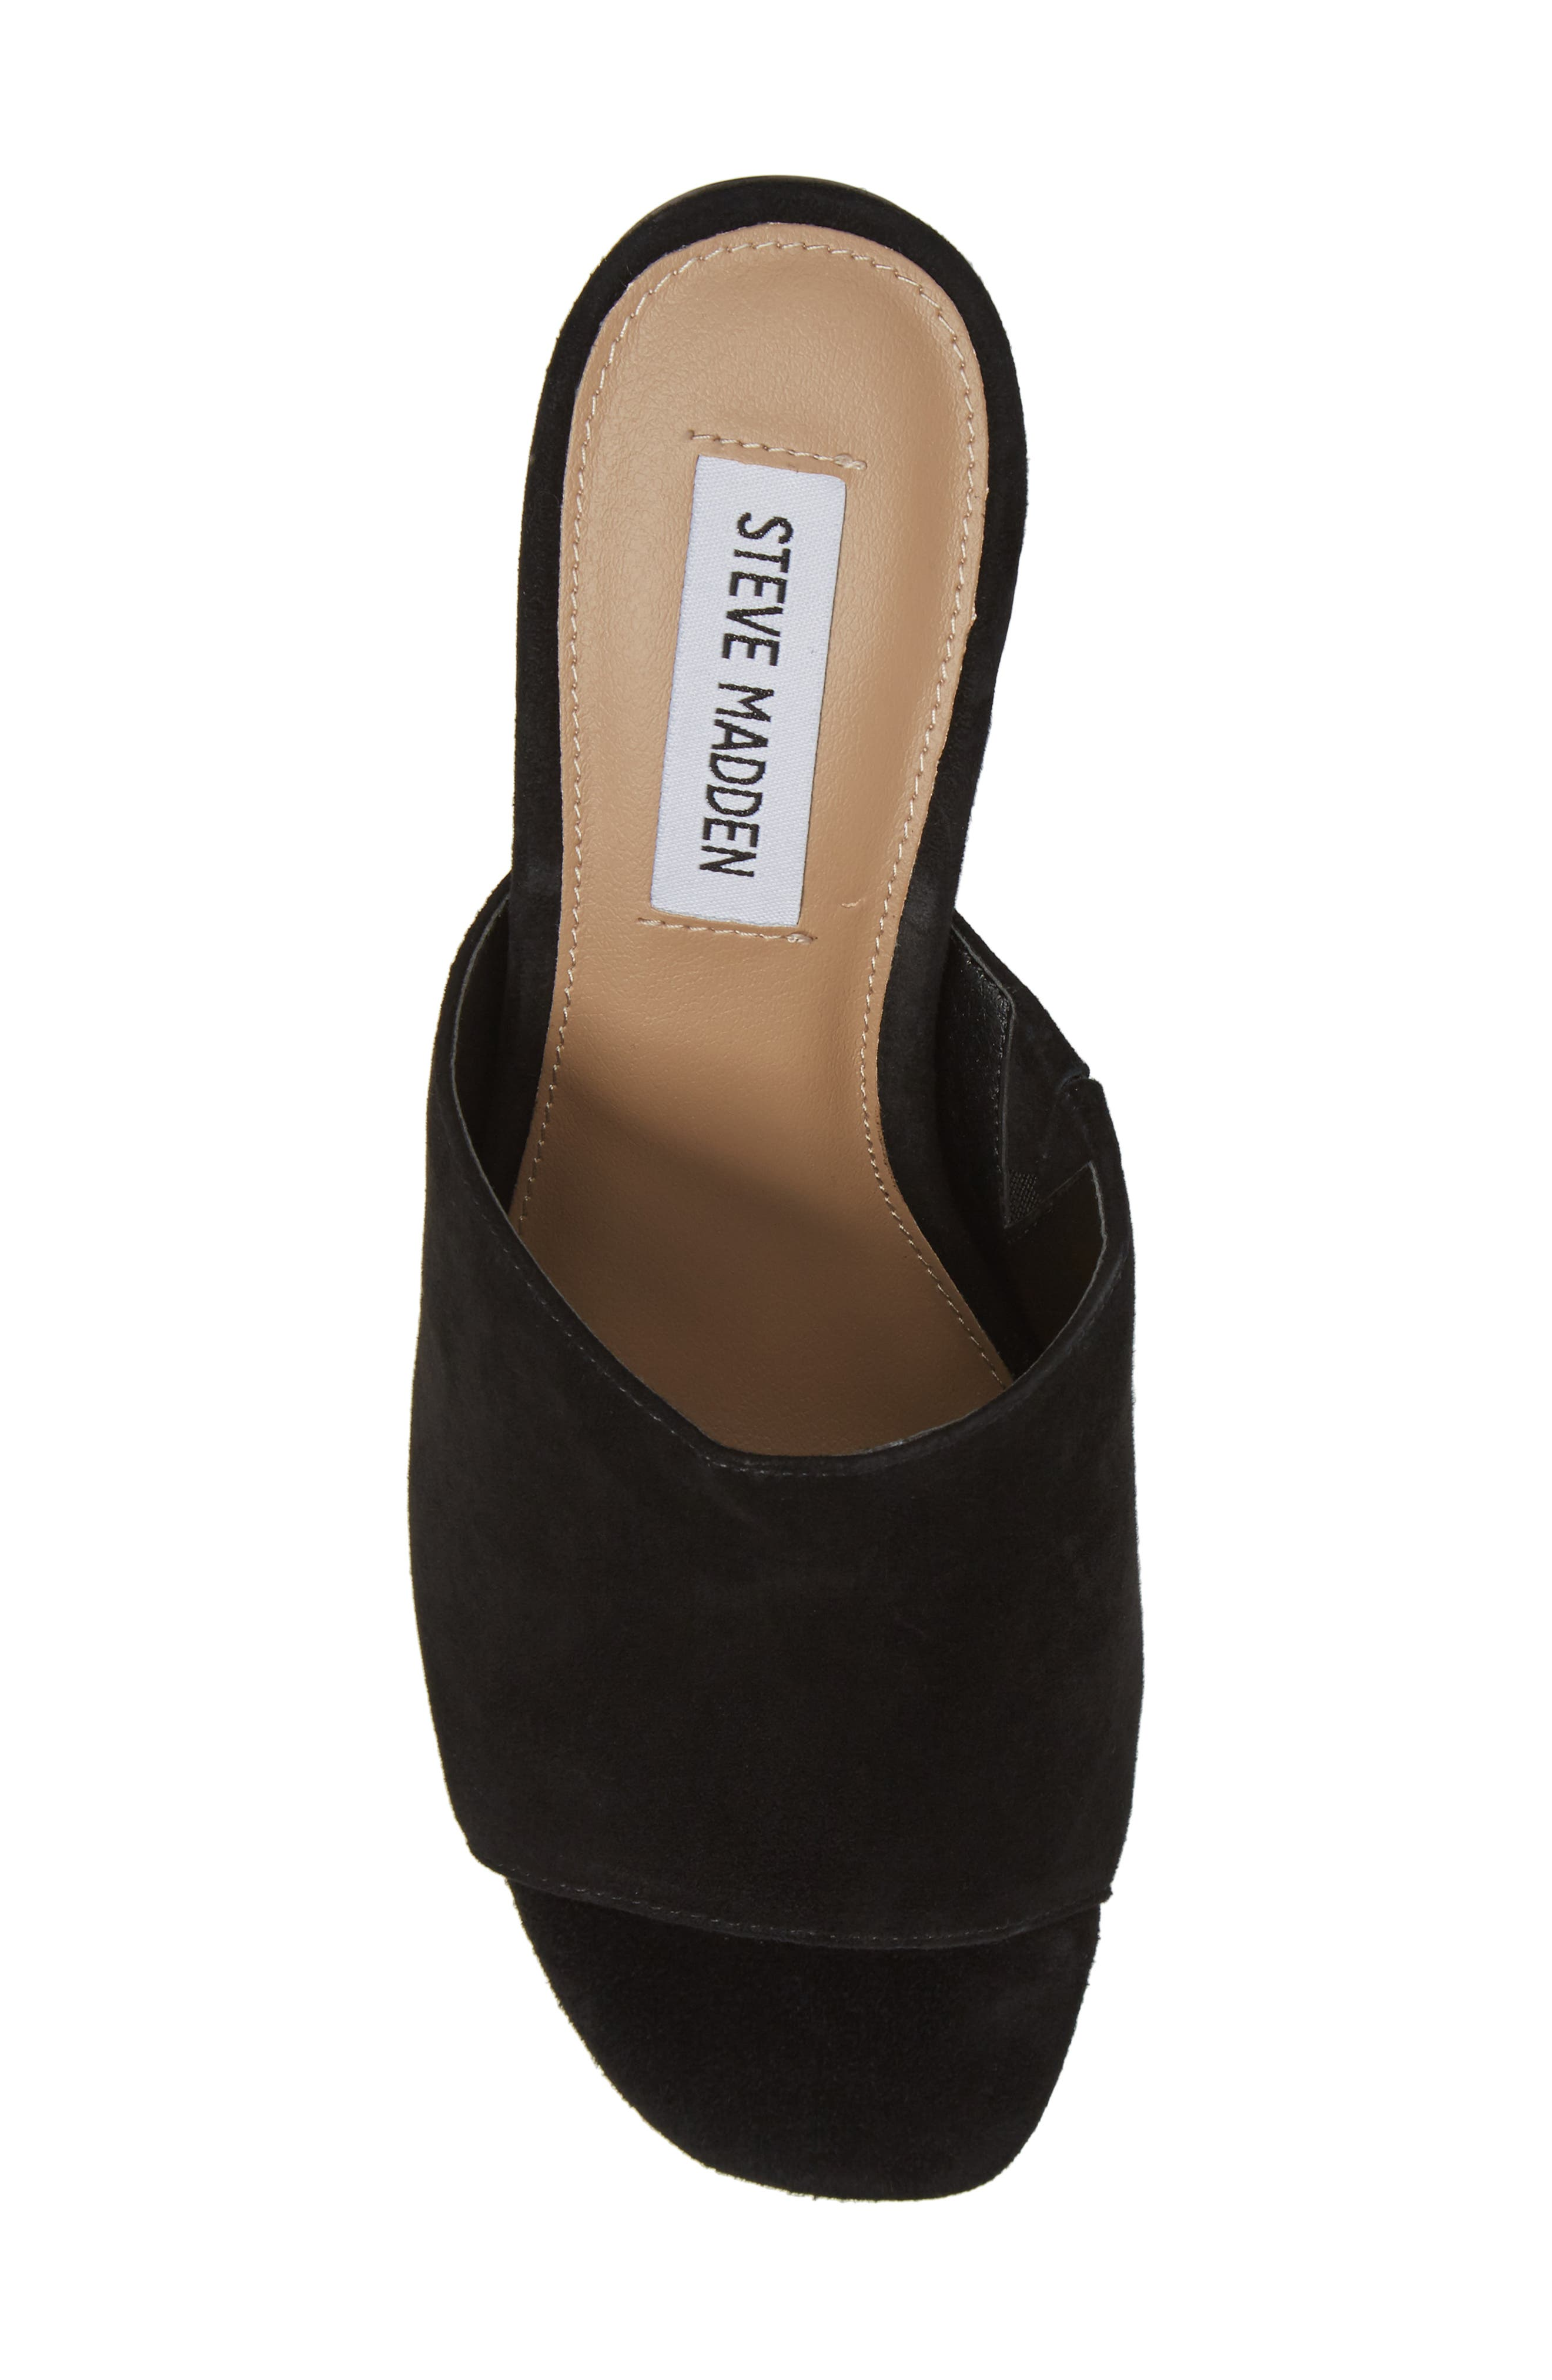 Dalis Clear Heel Slide Sandal,                             Alternate thumbnail 5, color,                             006